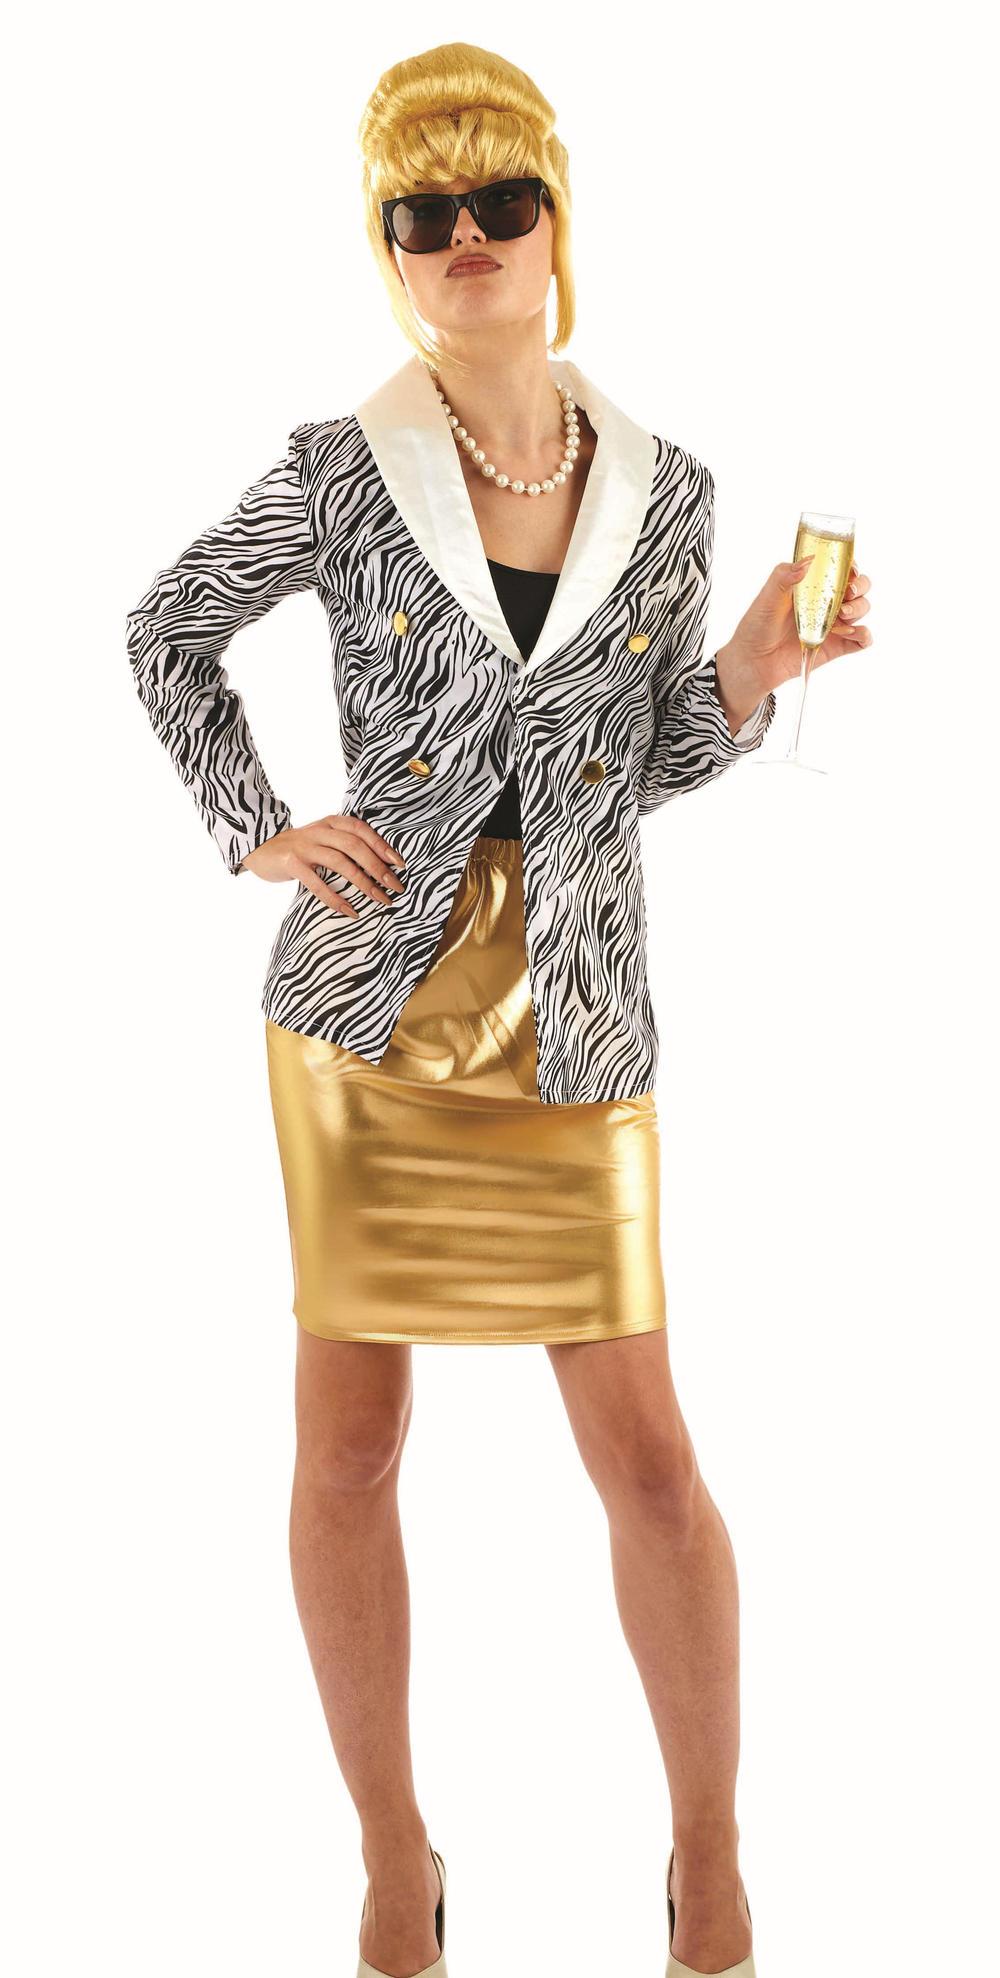 Lady Fabulous Ladies Fancy Dress TV Character Patsy 1990s Womens Adults Costume